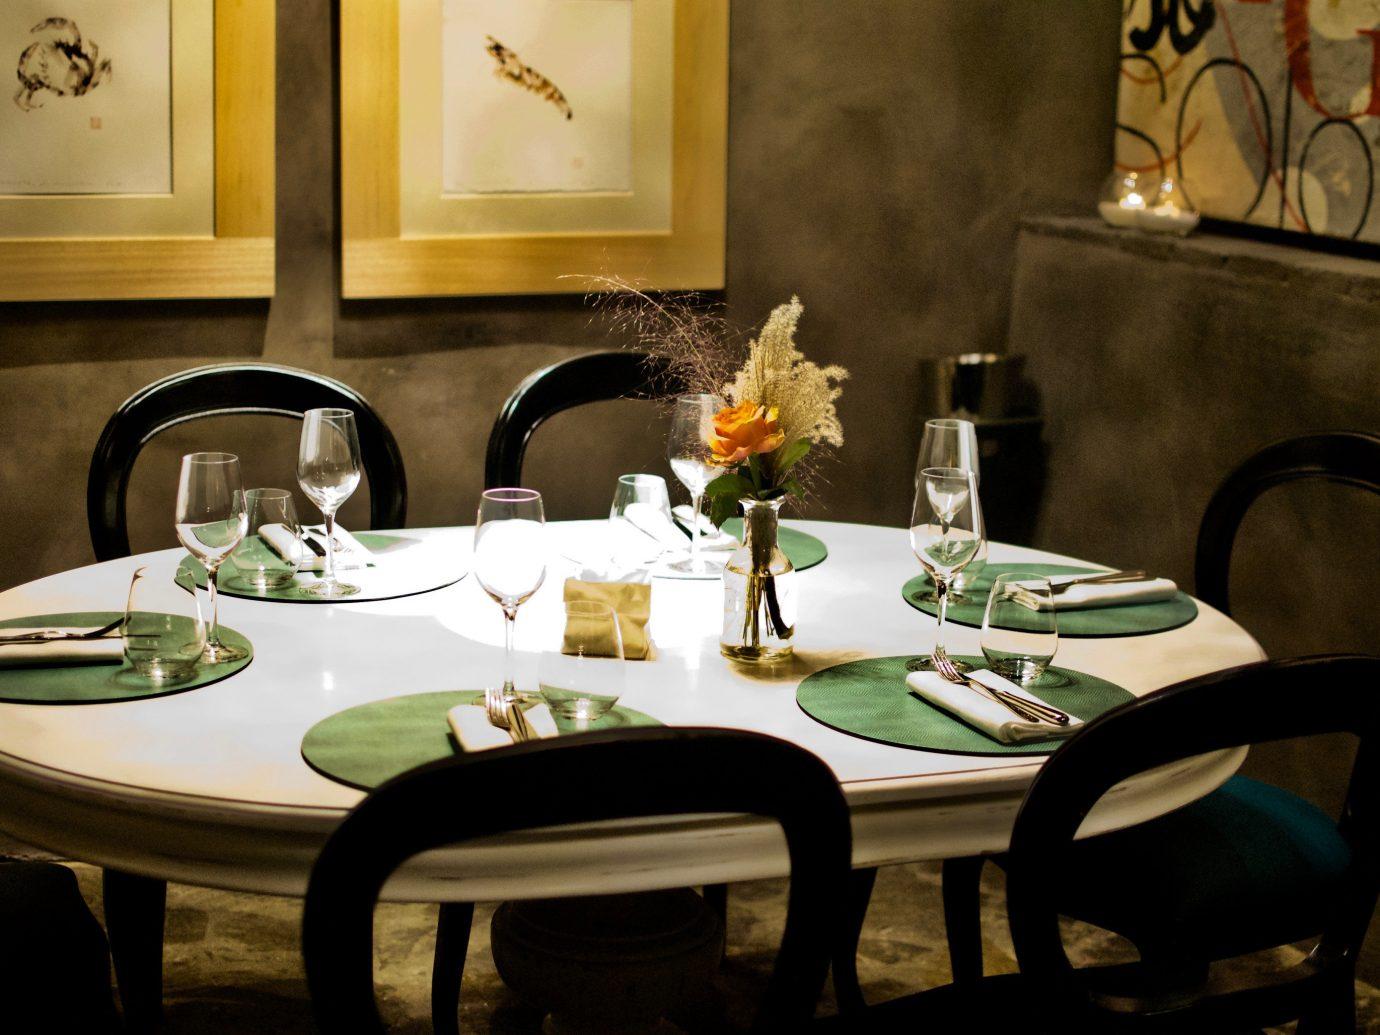 Arts + Culture table indoor dining room room restaurant meal interior design home estate dinner living room set